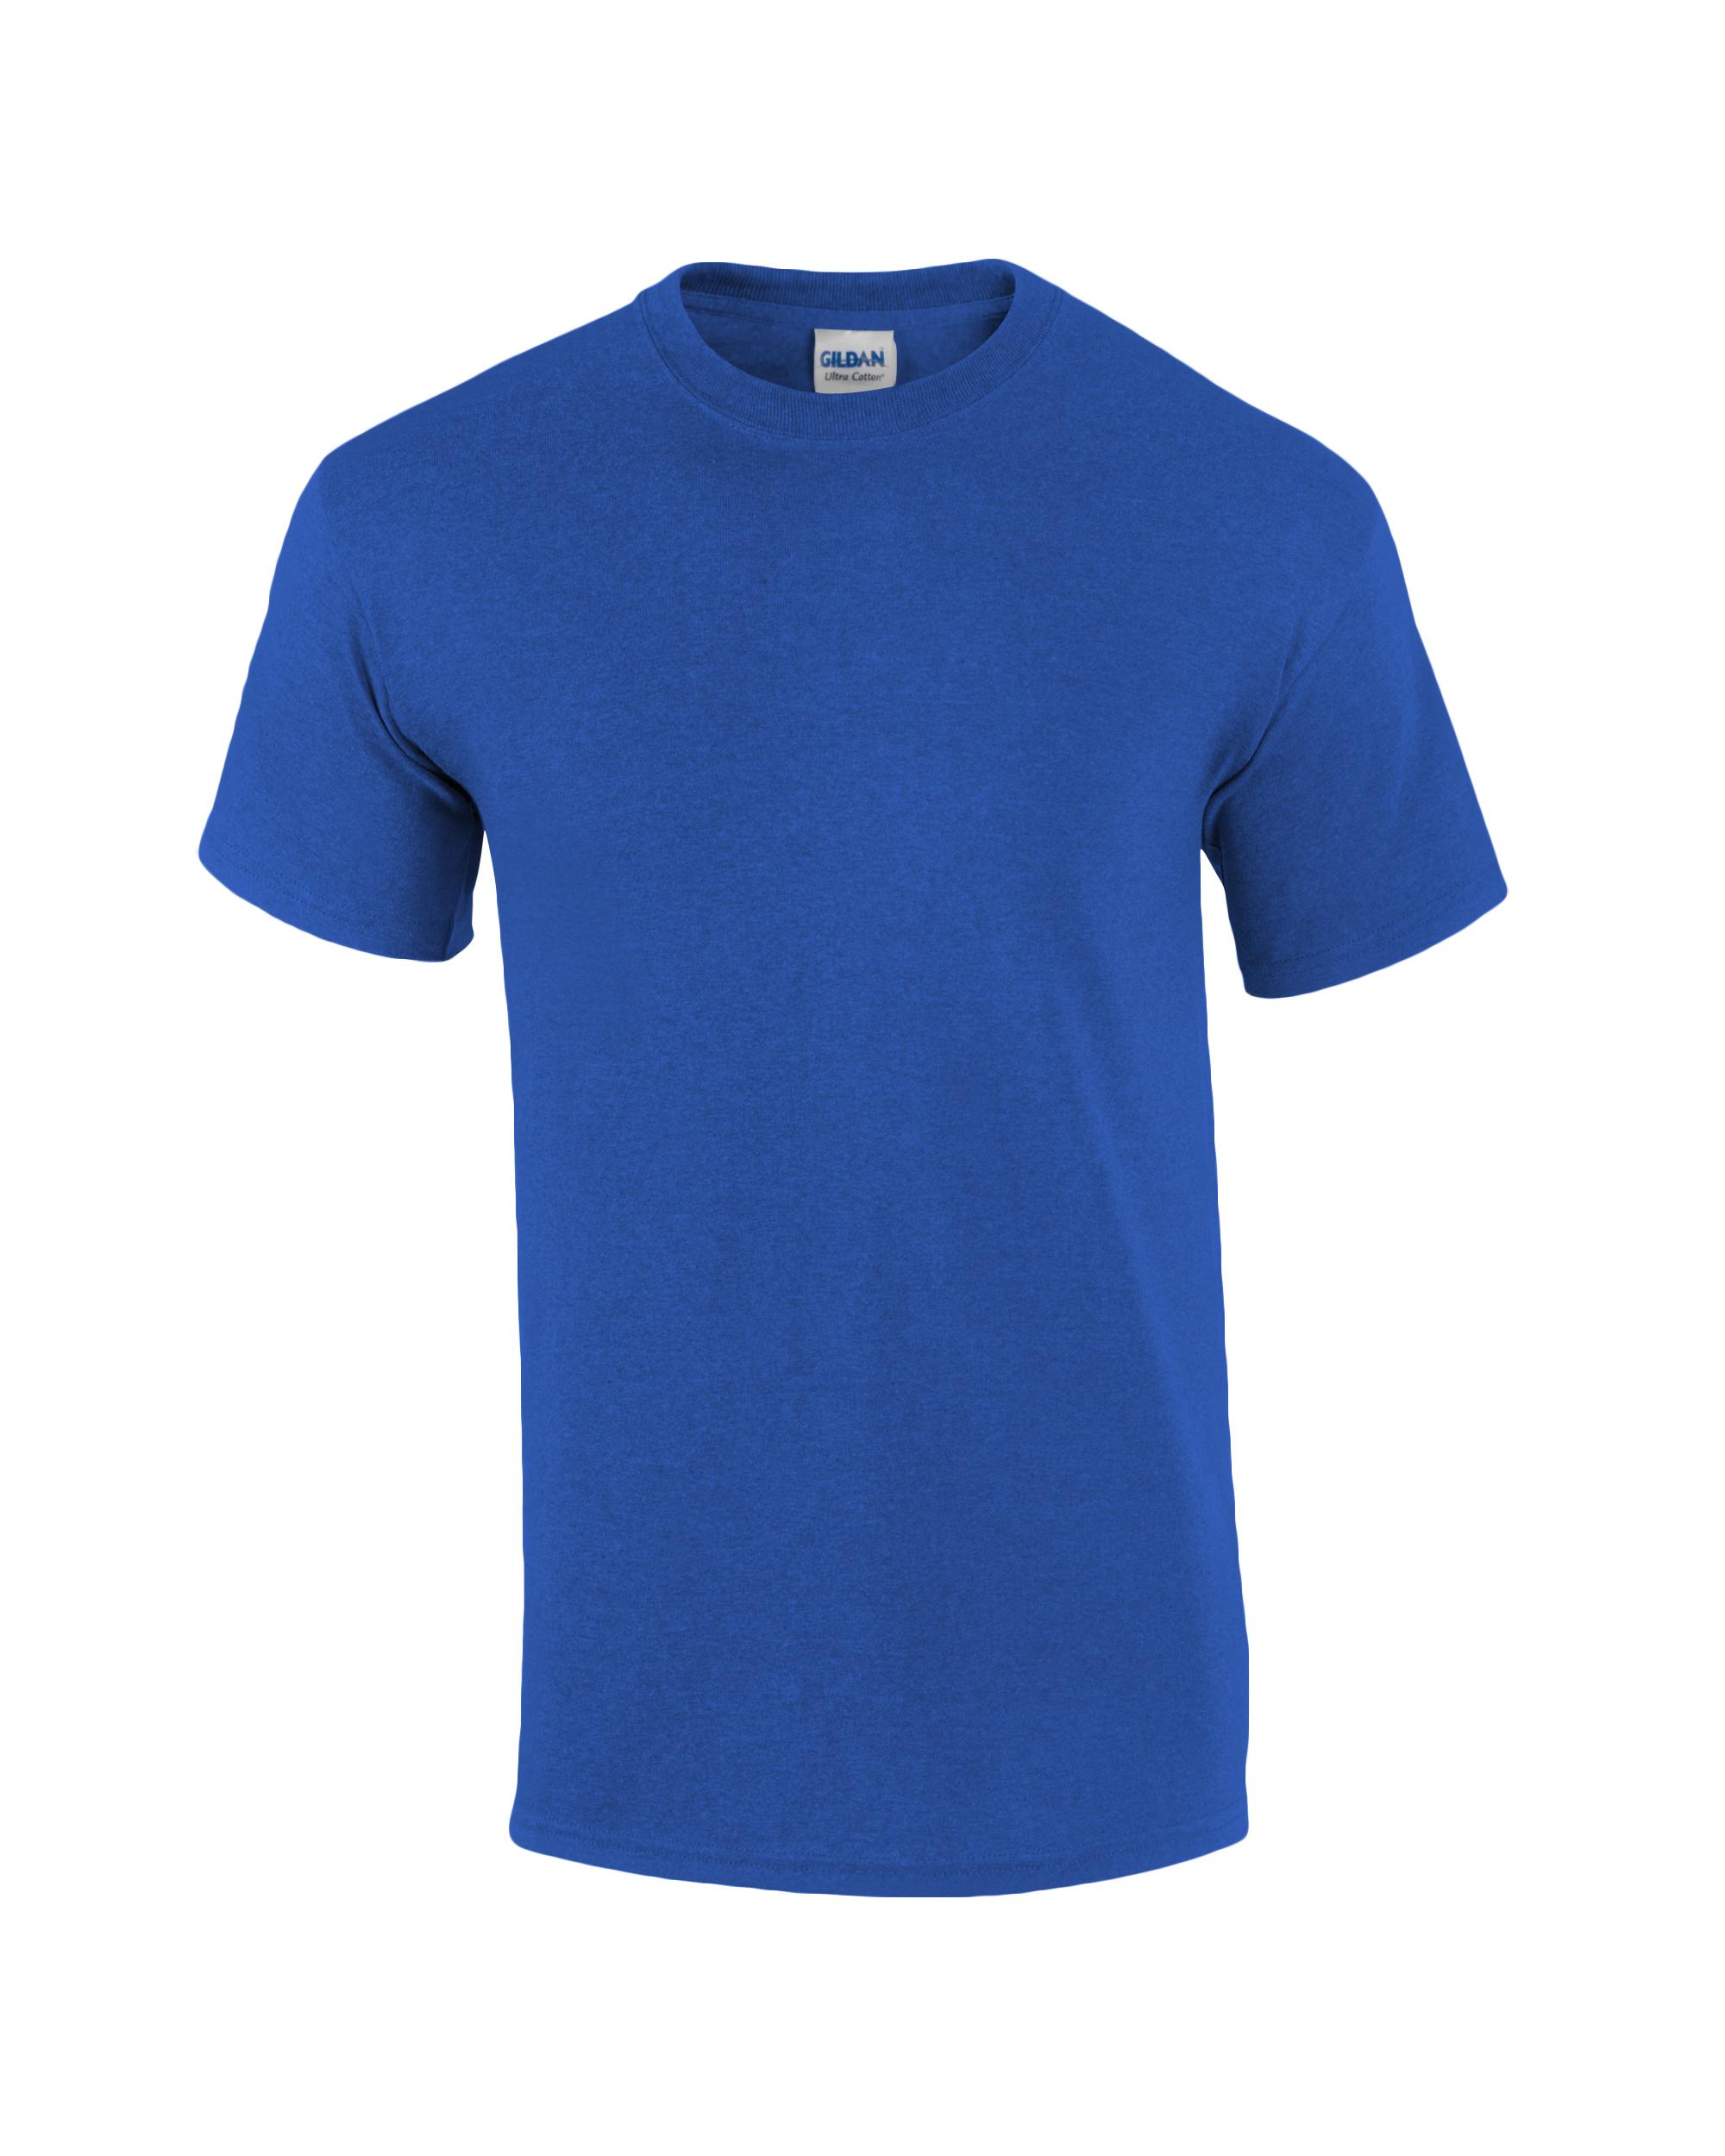 869c8ee5 ... 2000-287C_antique royal-6.0 oz -ultra cotton- Mens shirts-ladies shirts  ...